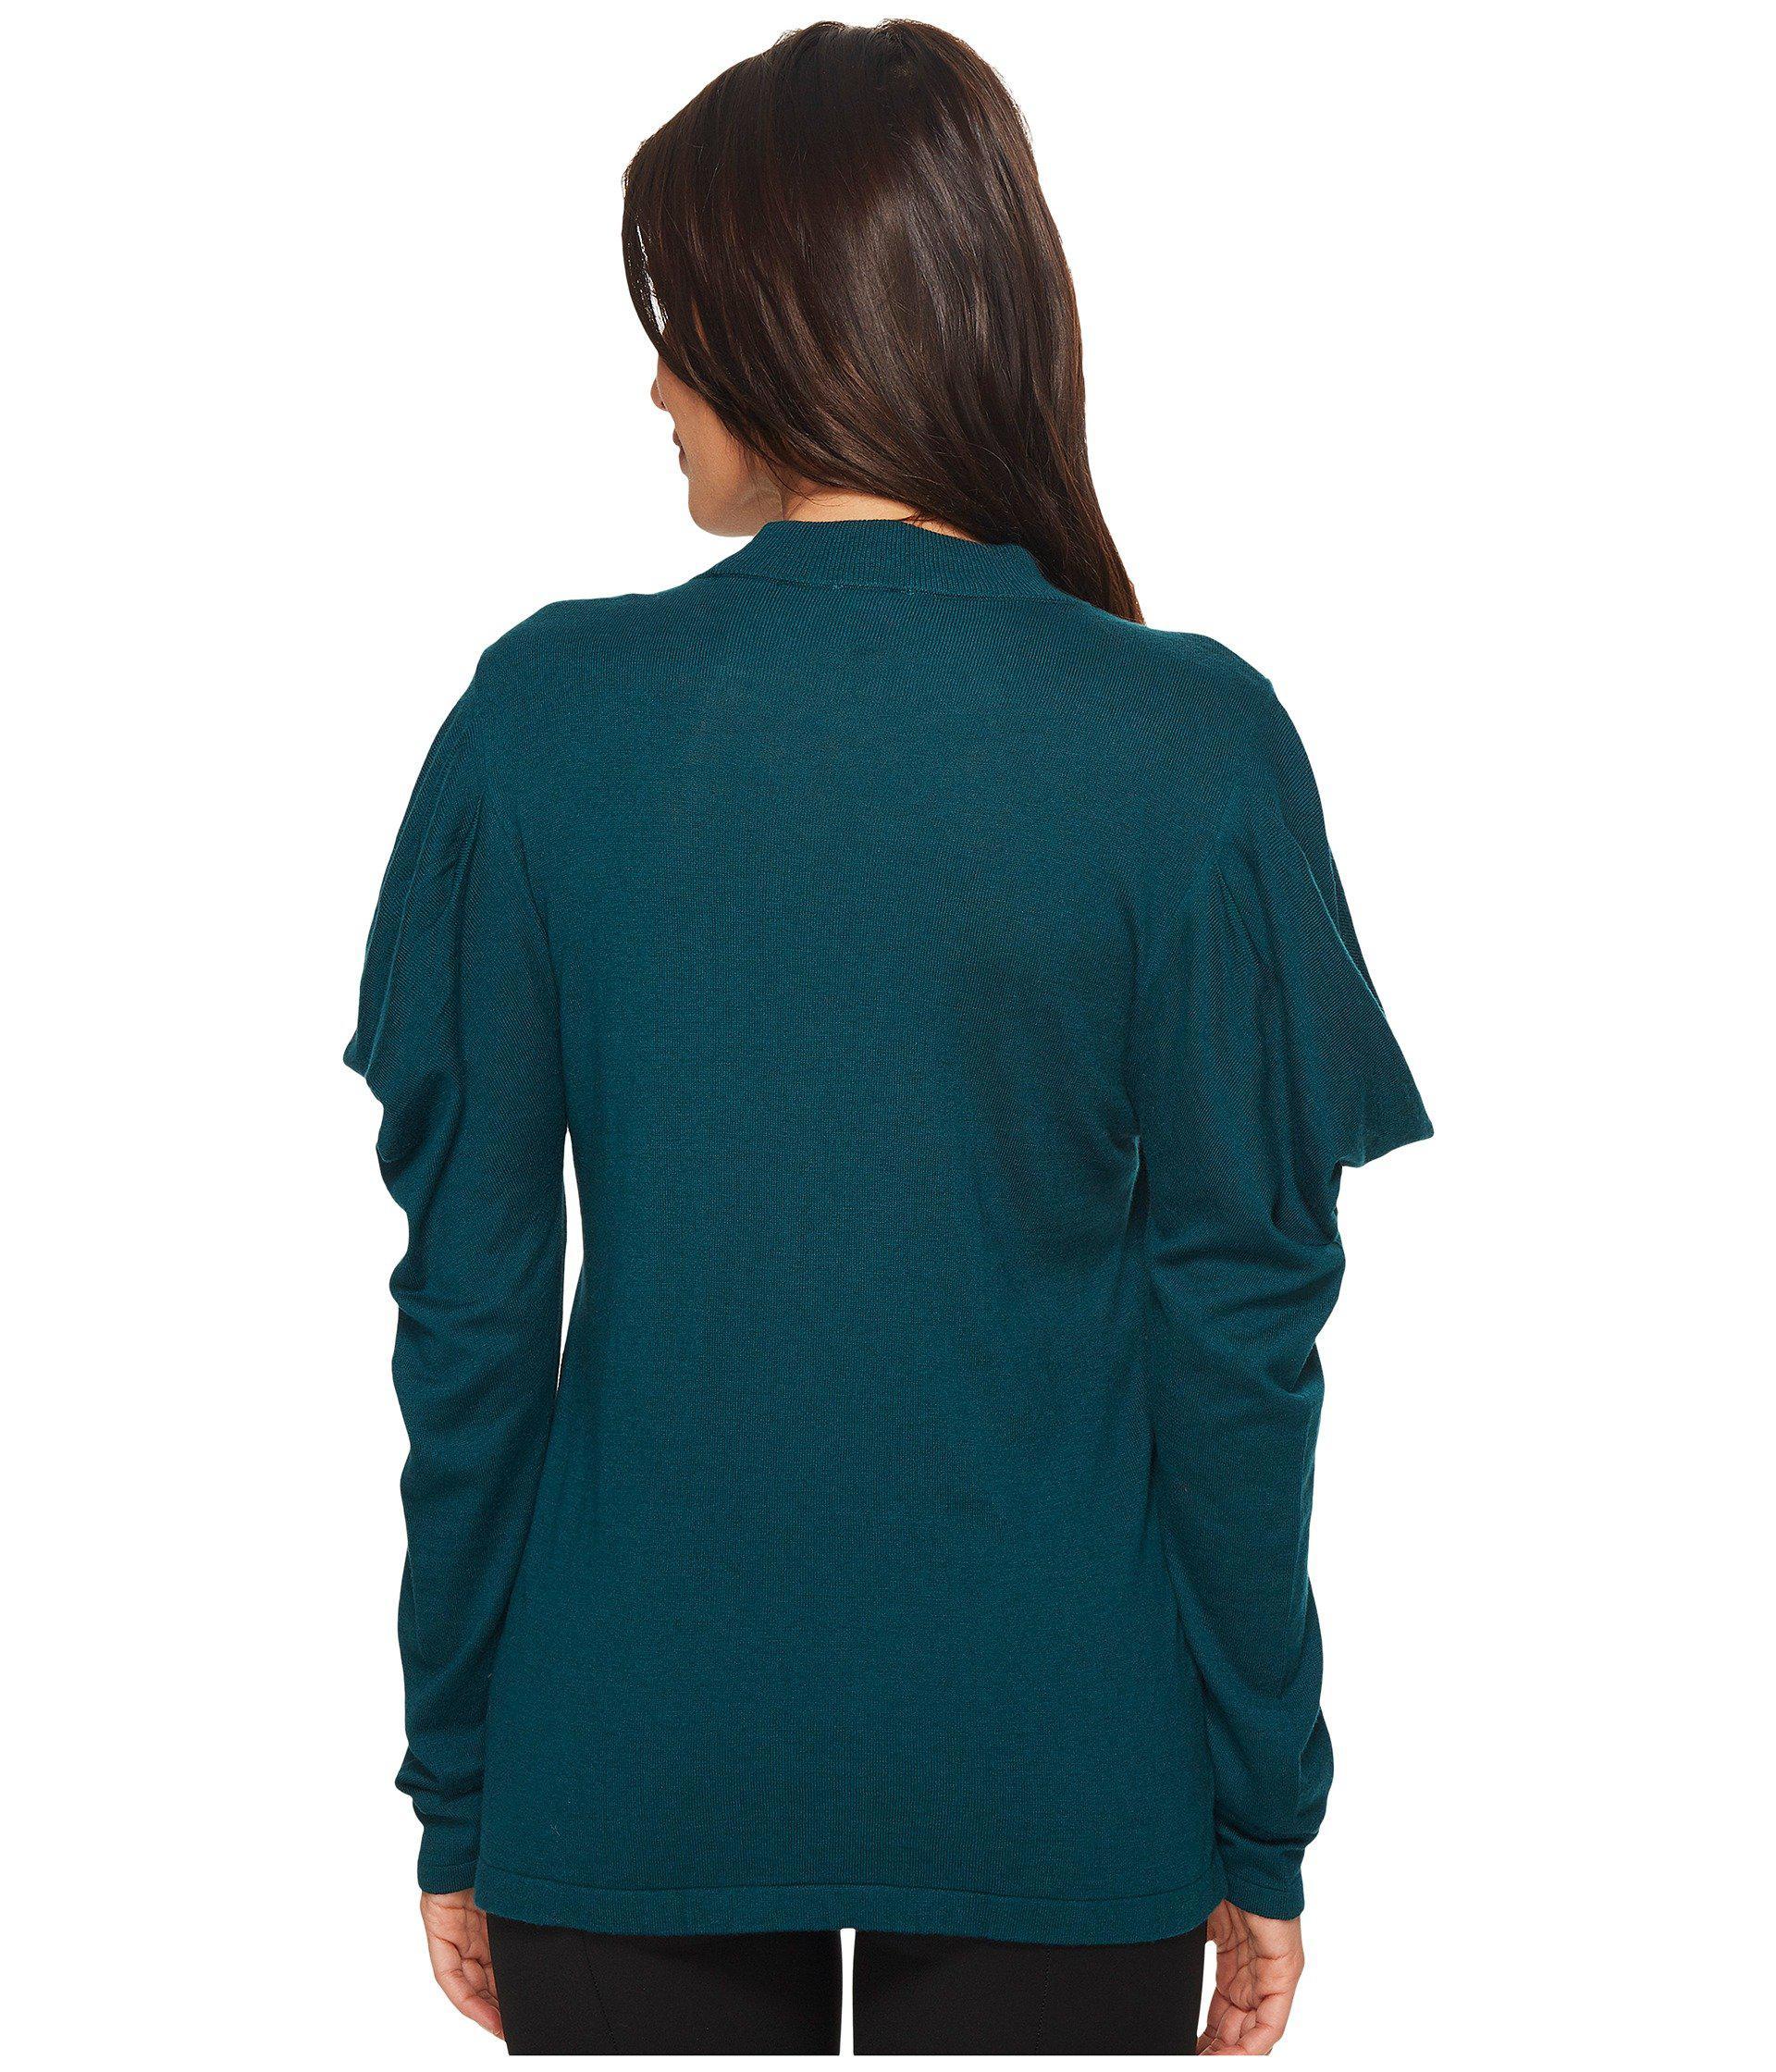 da6cac94a3819 ... Long Sleeve Mock Neck Drape Shoulder Sweater - Lyst. View fullscreen